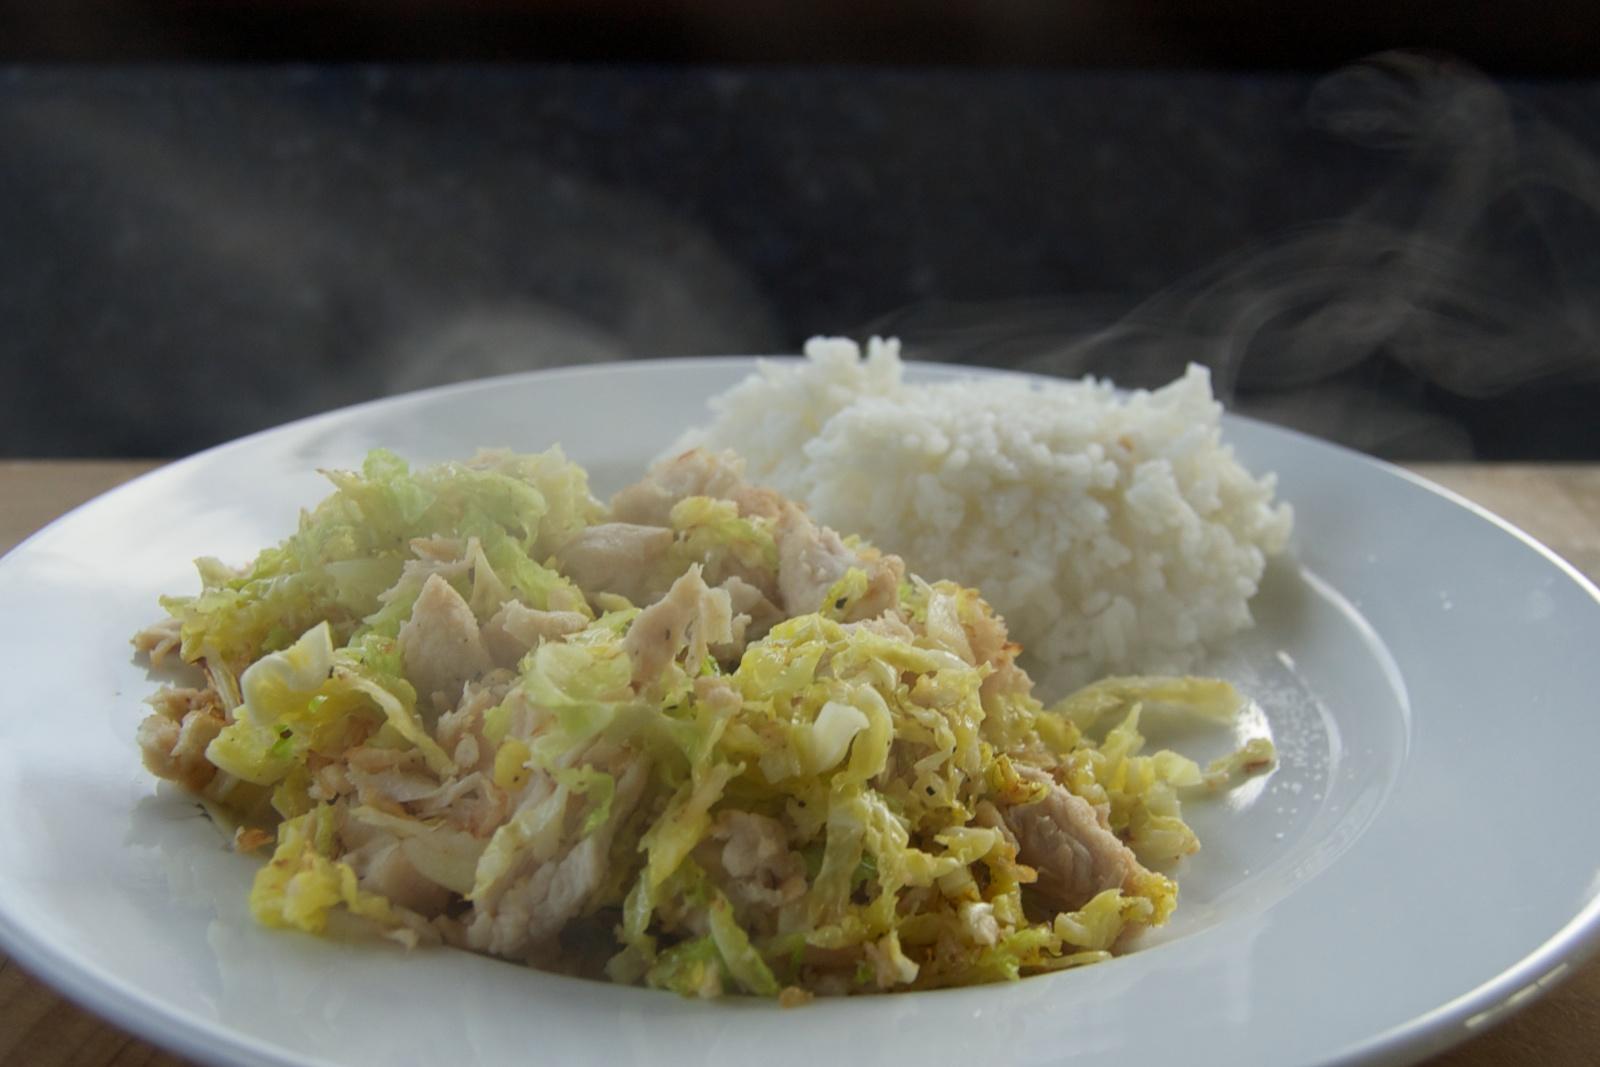 http://blog.rickk.com/food/2013/01/23/ate.2013.01.23.l.jpg